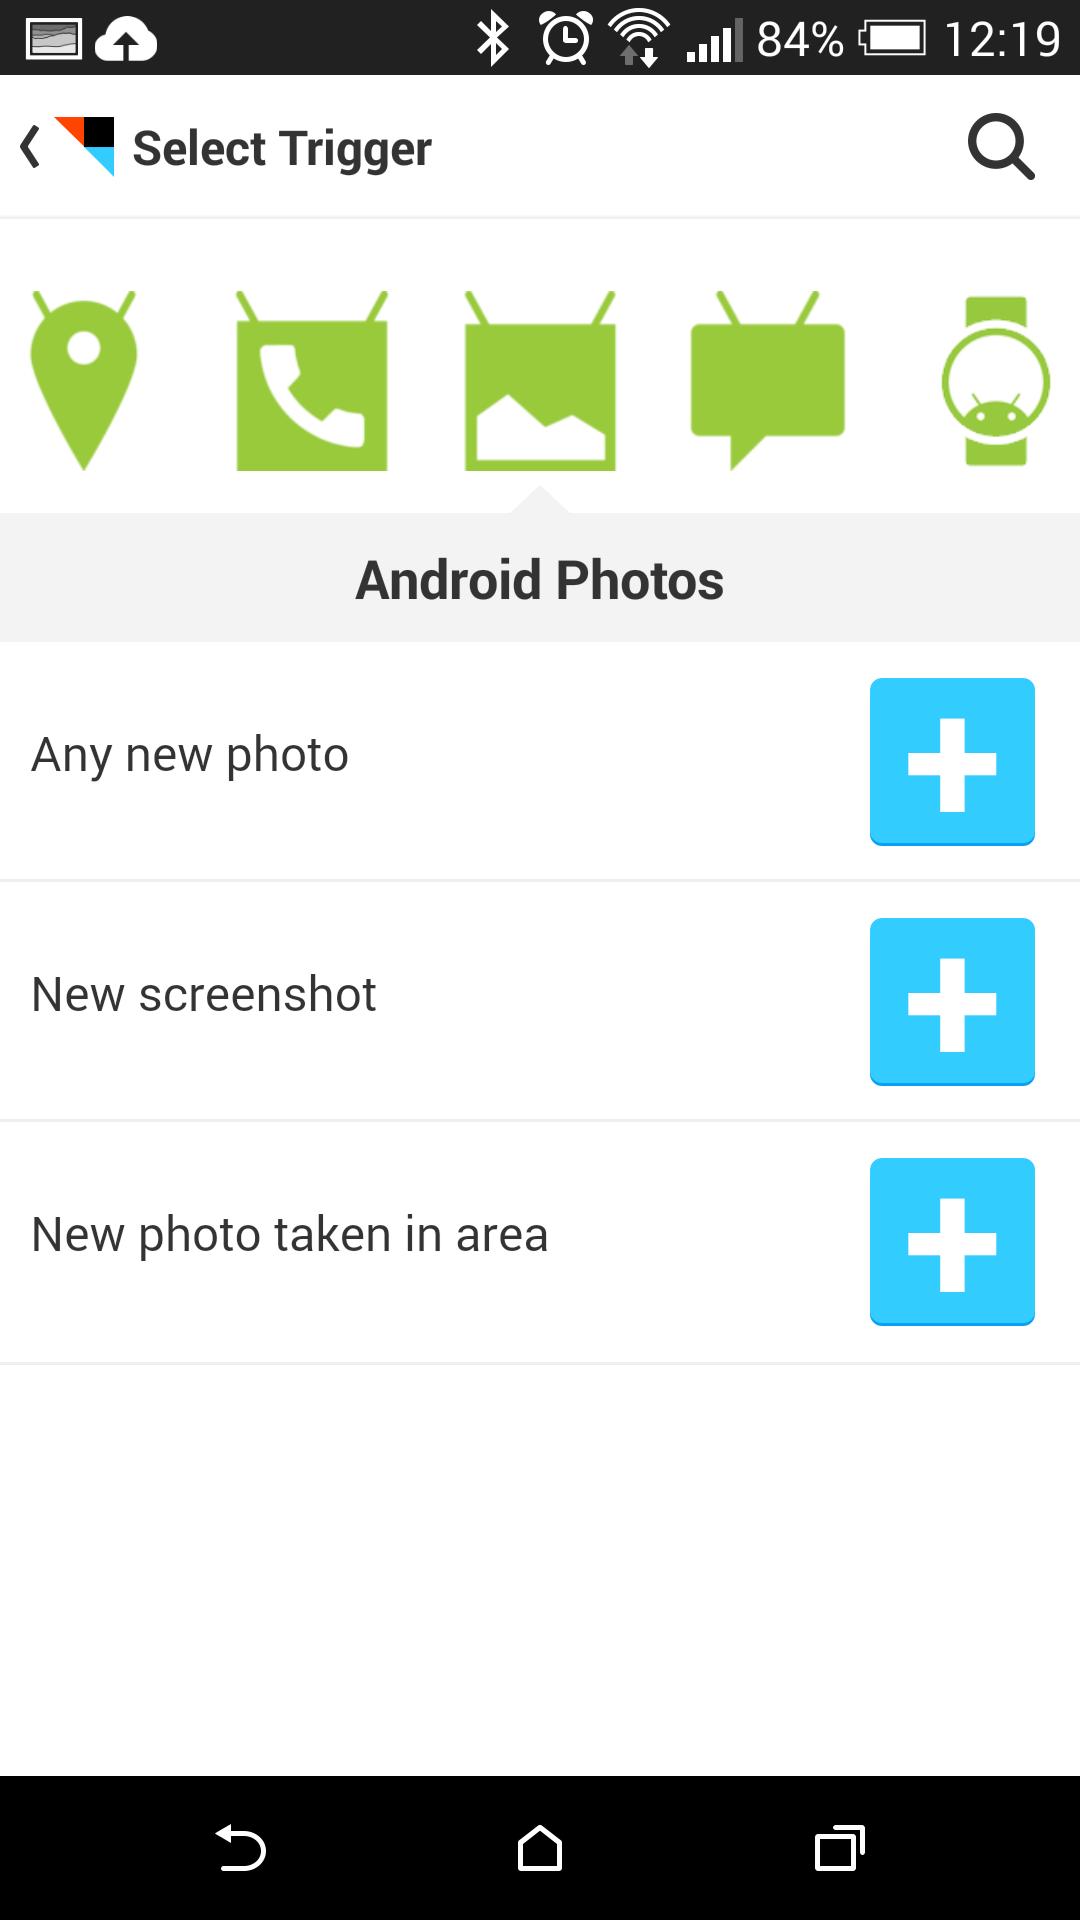 Android Wear: Pimp my watch - ... oder auch Funktionen des Smartphones. (Screenshot: Golem.de)